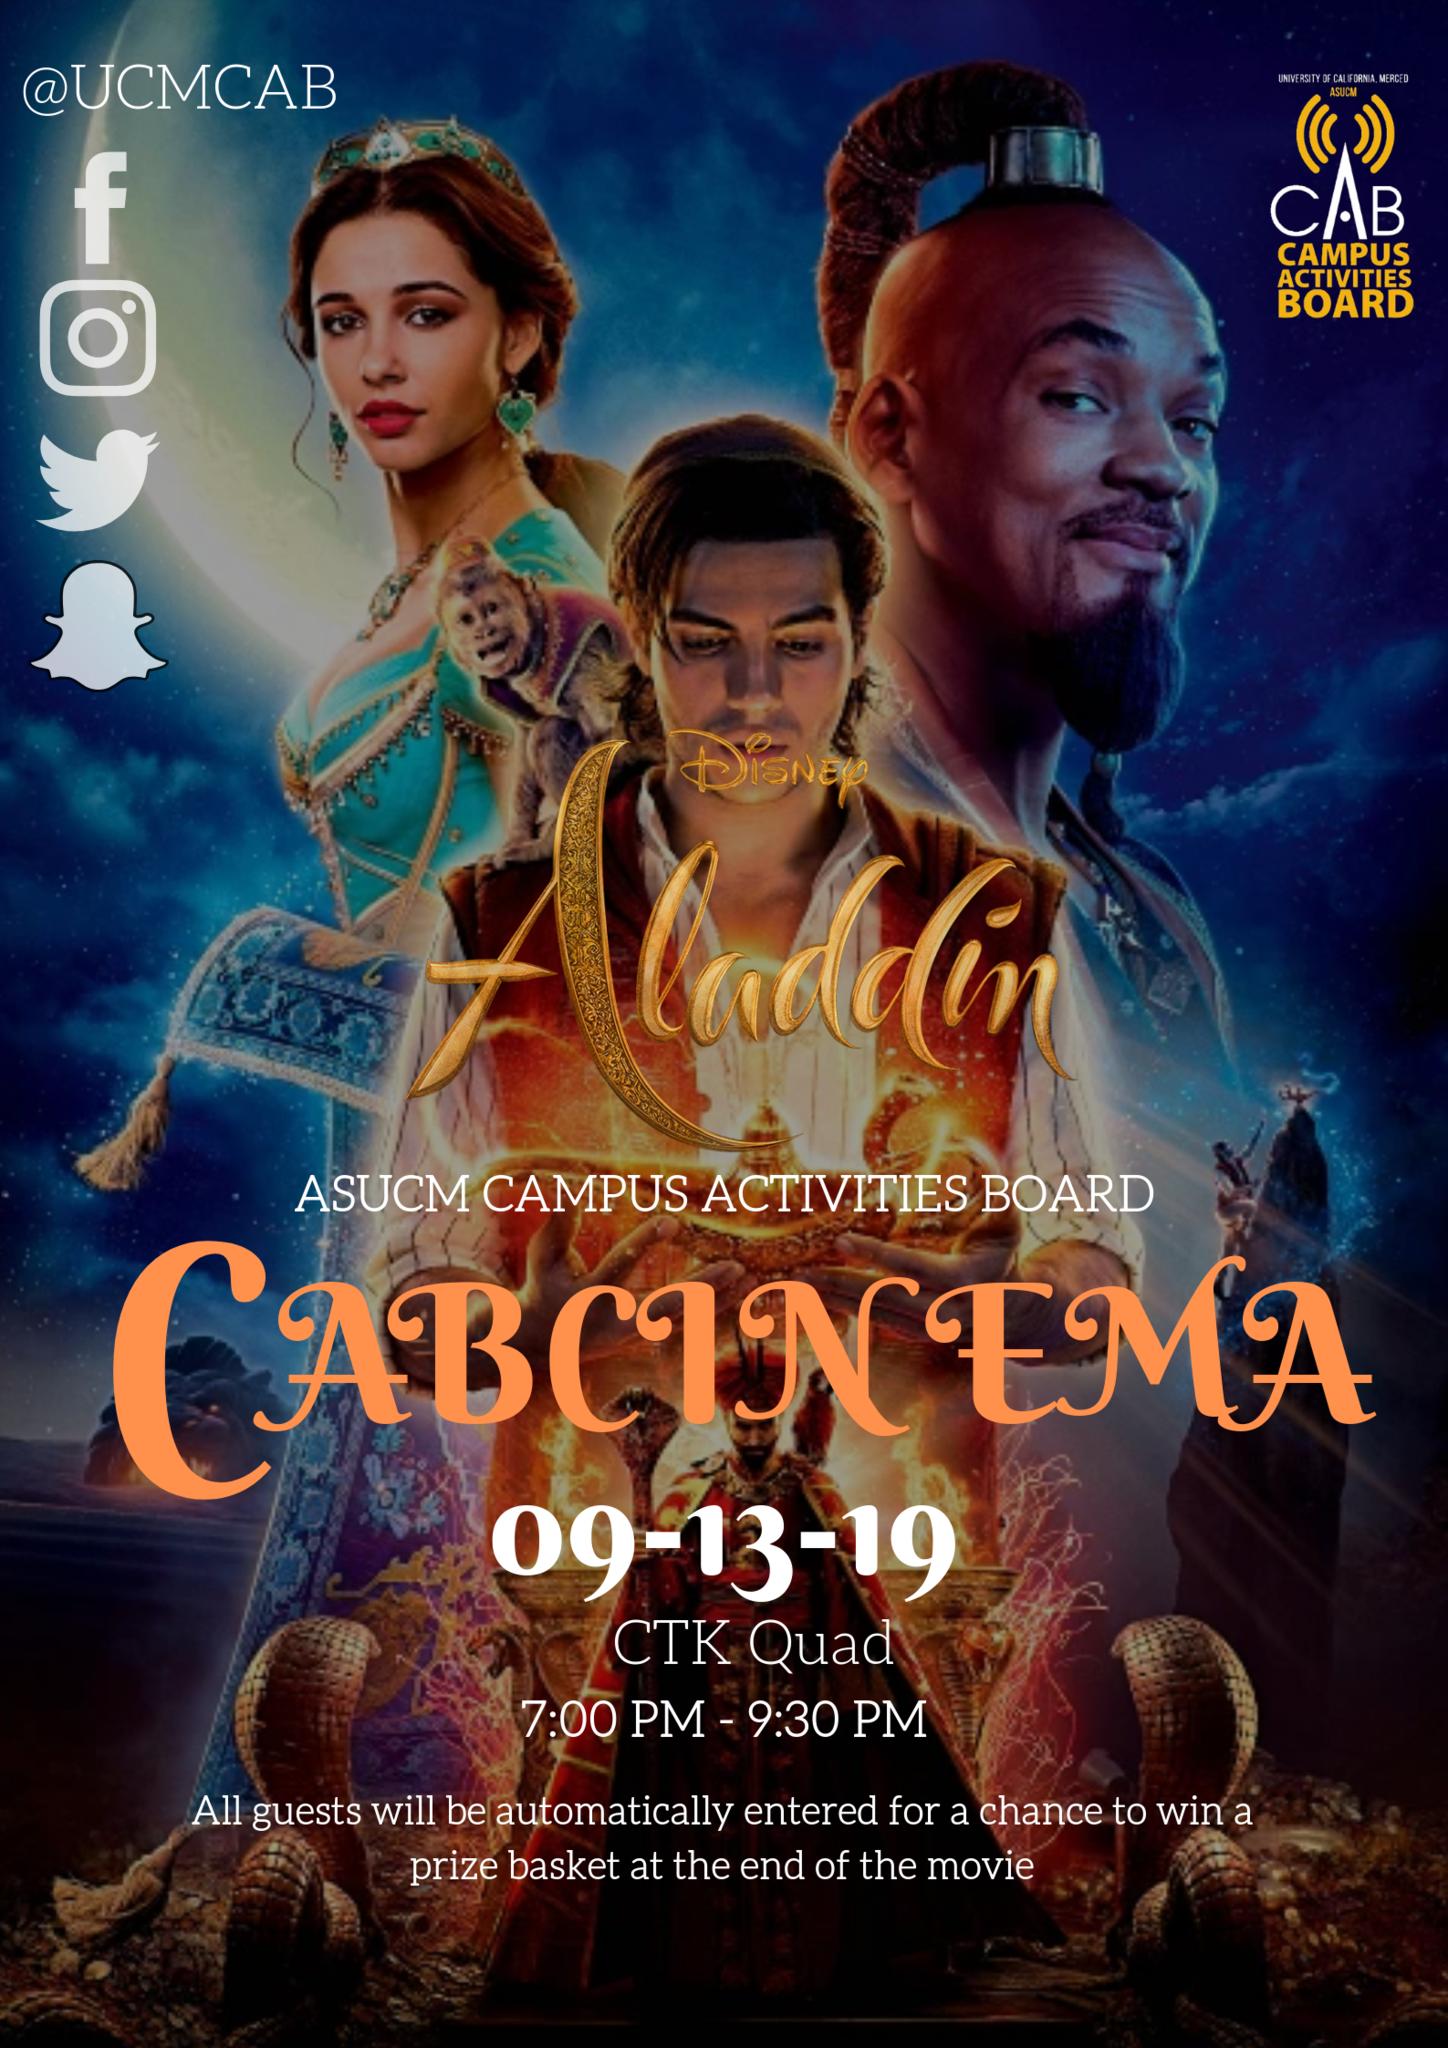 CABCinema Fall 2019